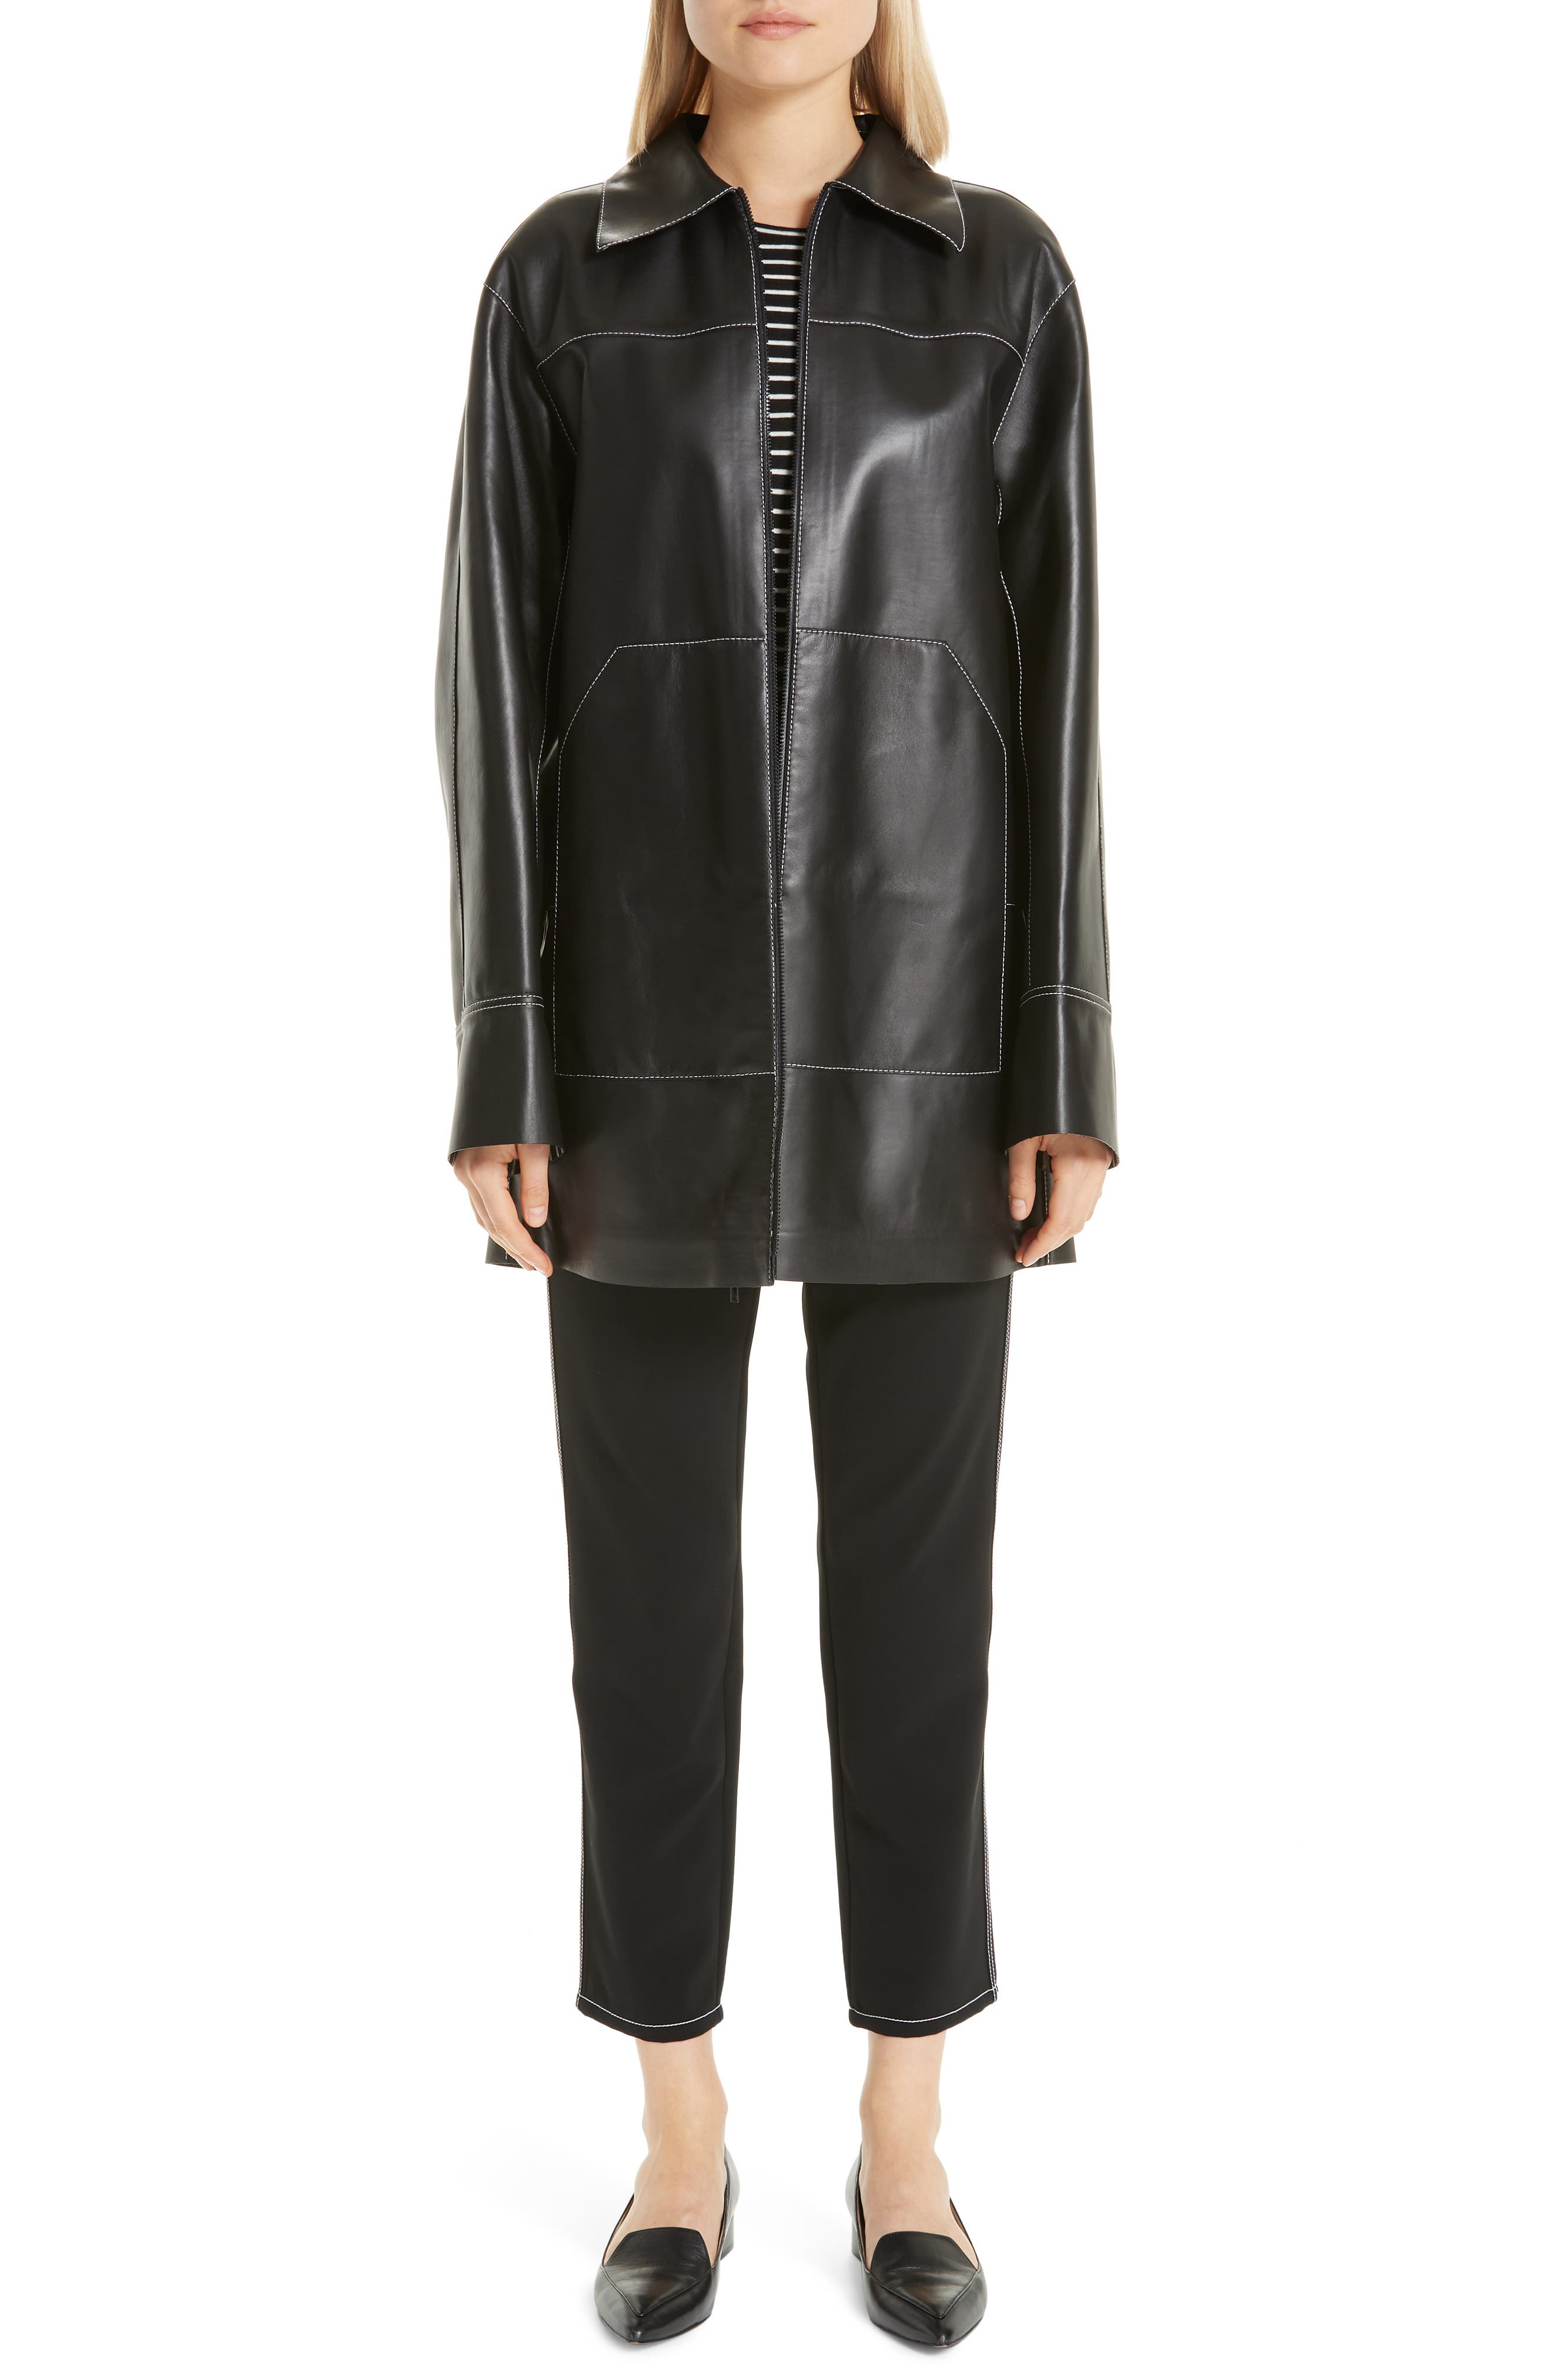 Christopher Leather Jacket,                             Alternate thumbnail 8, color,                             BLACK